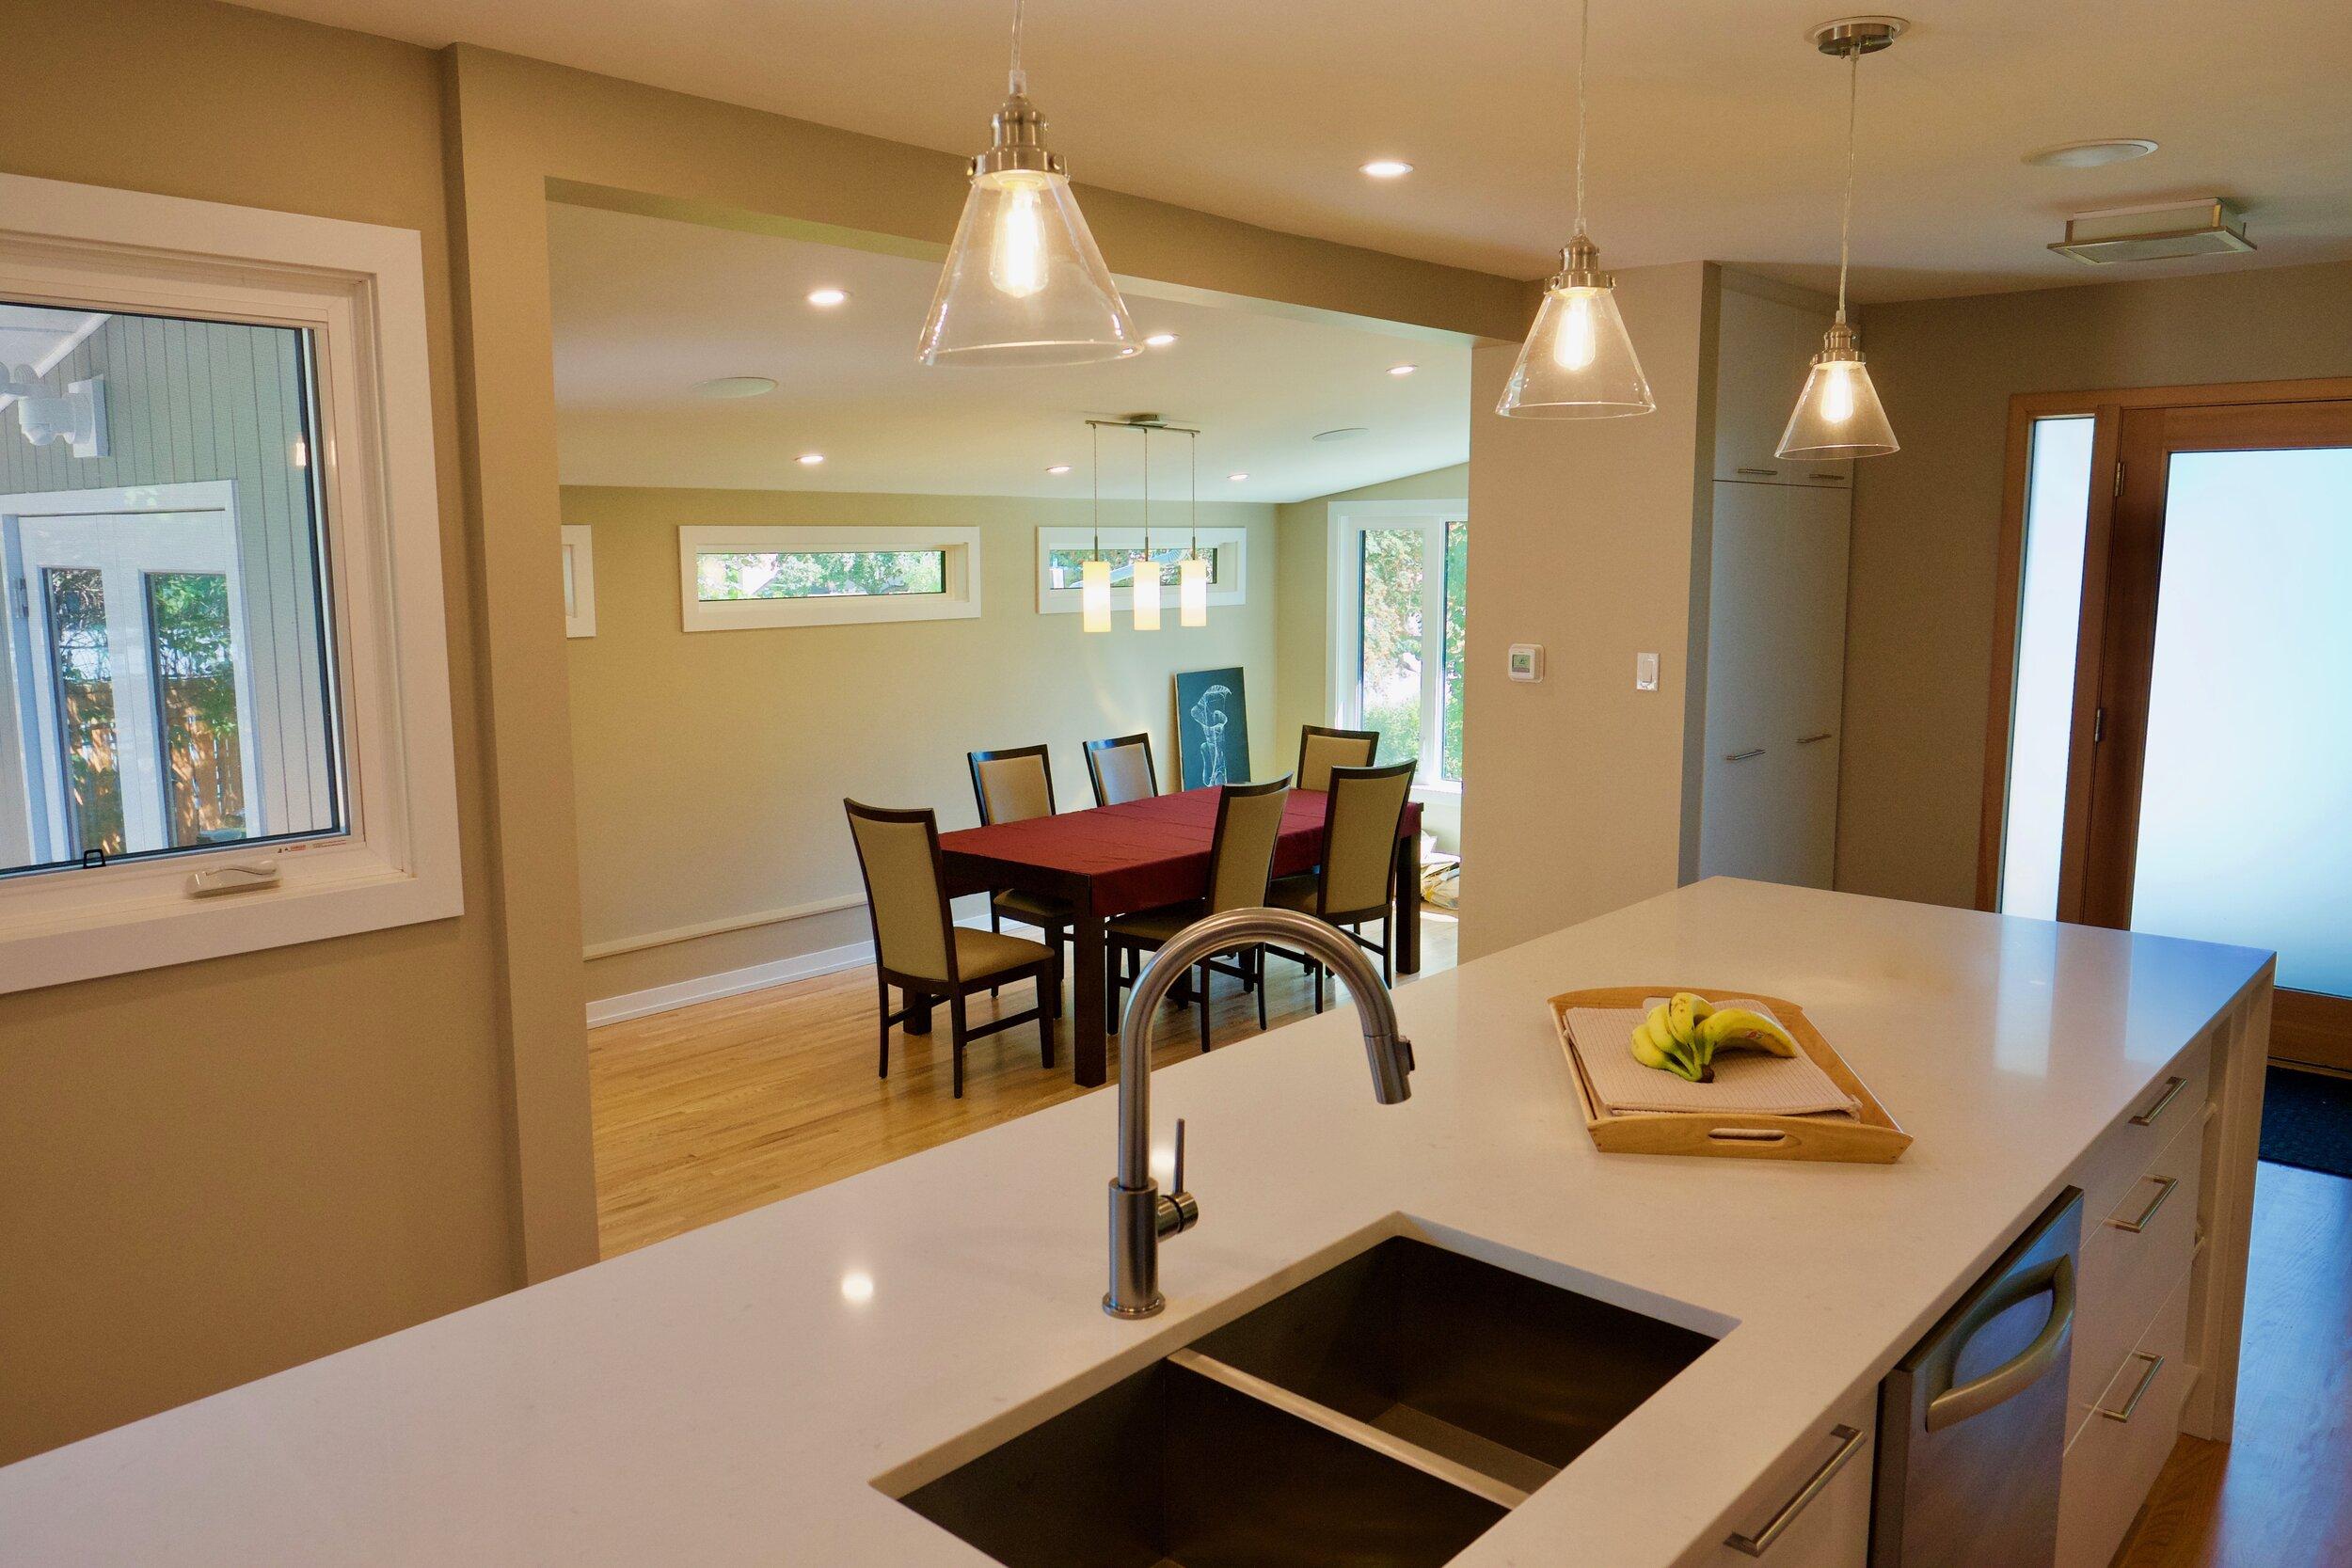 kitchen renovation and home additon Calgary.jpeg